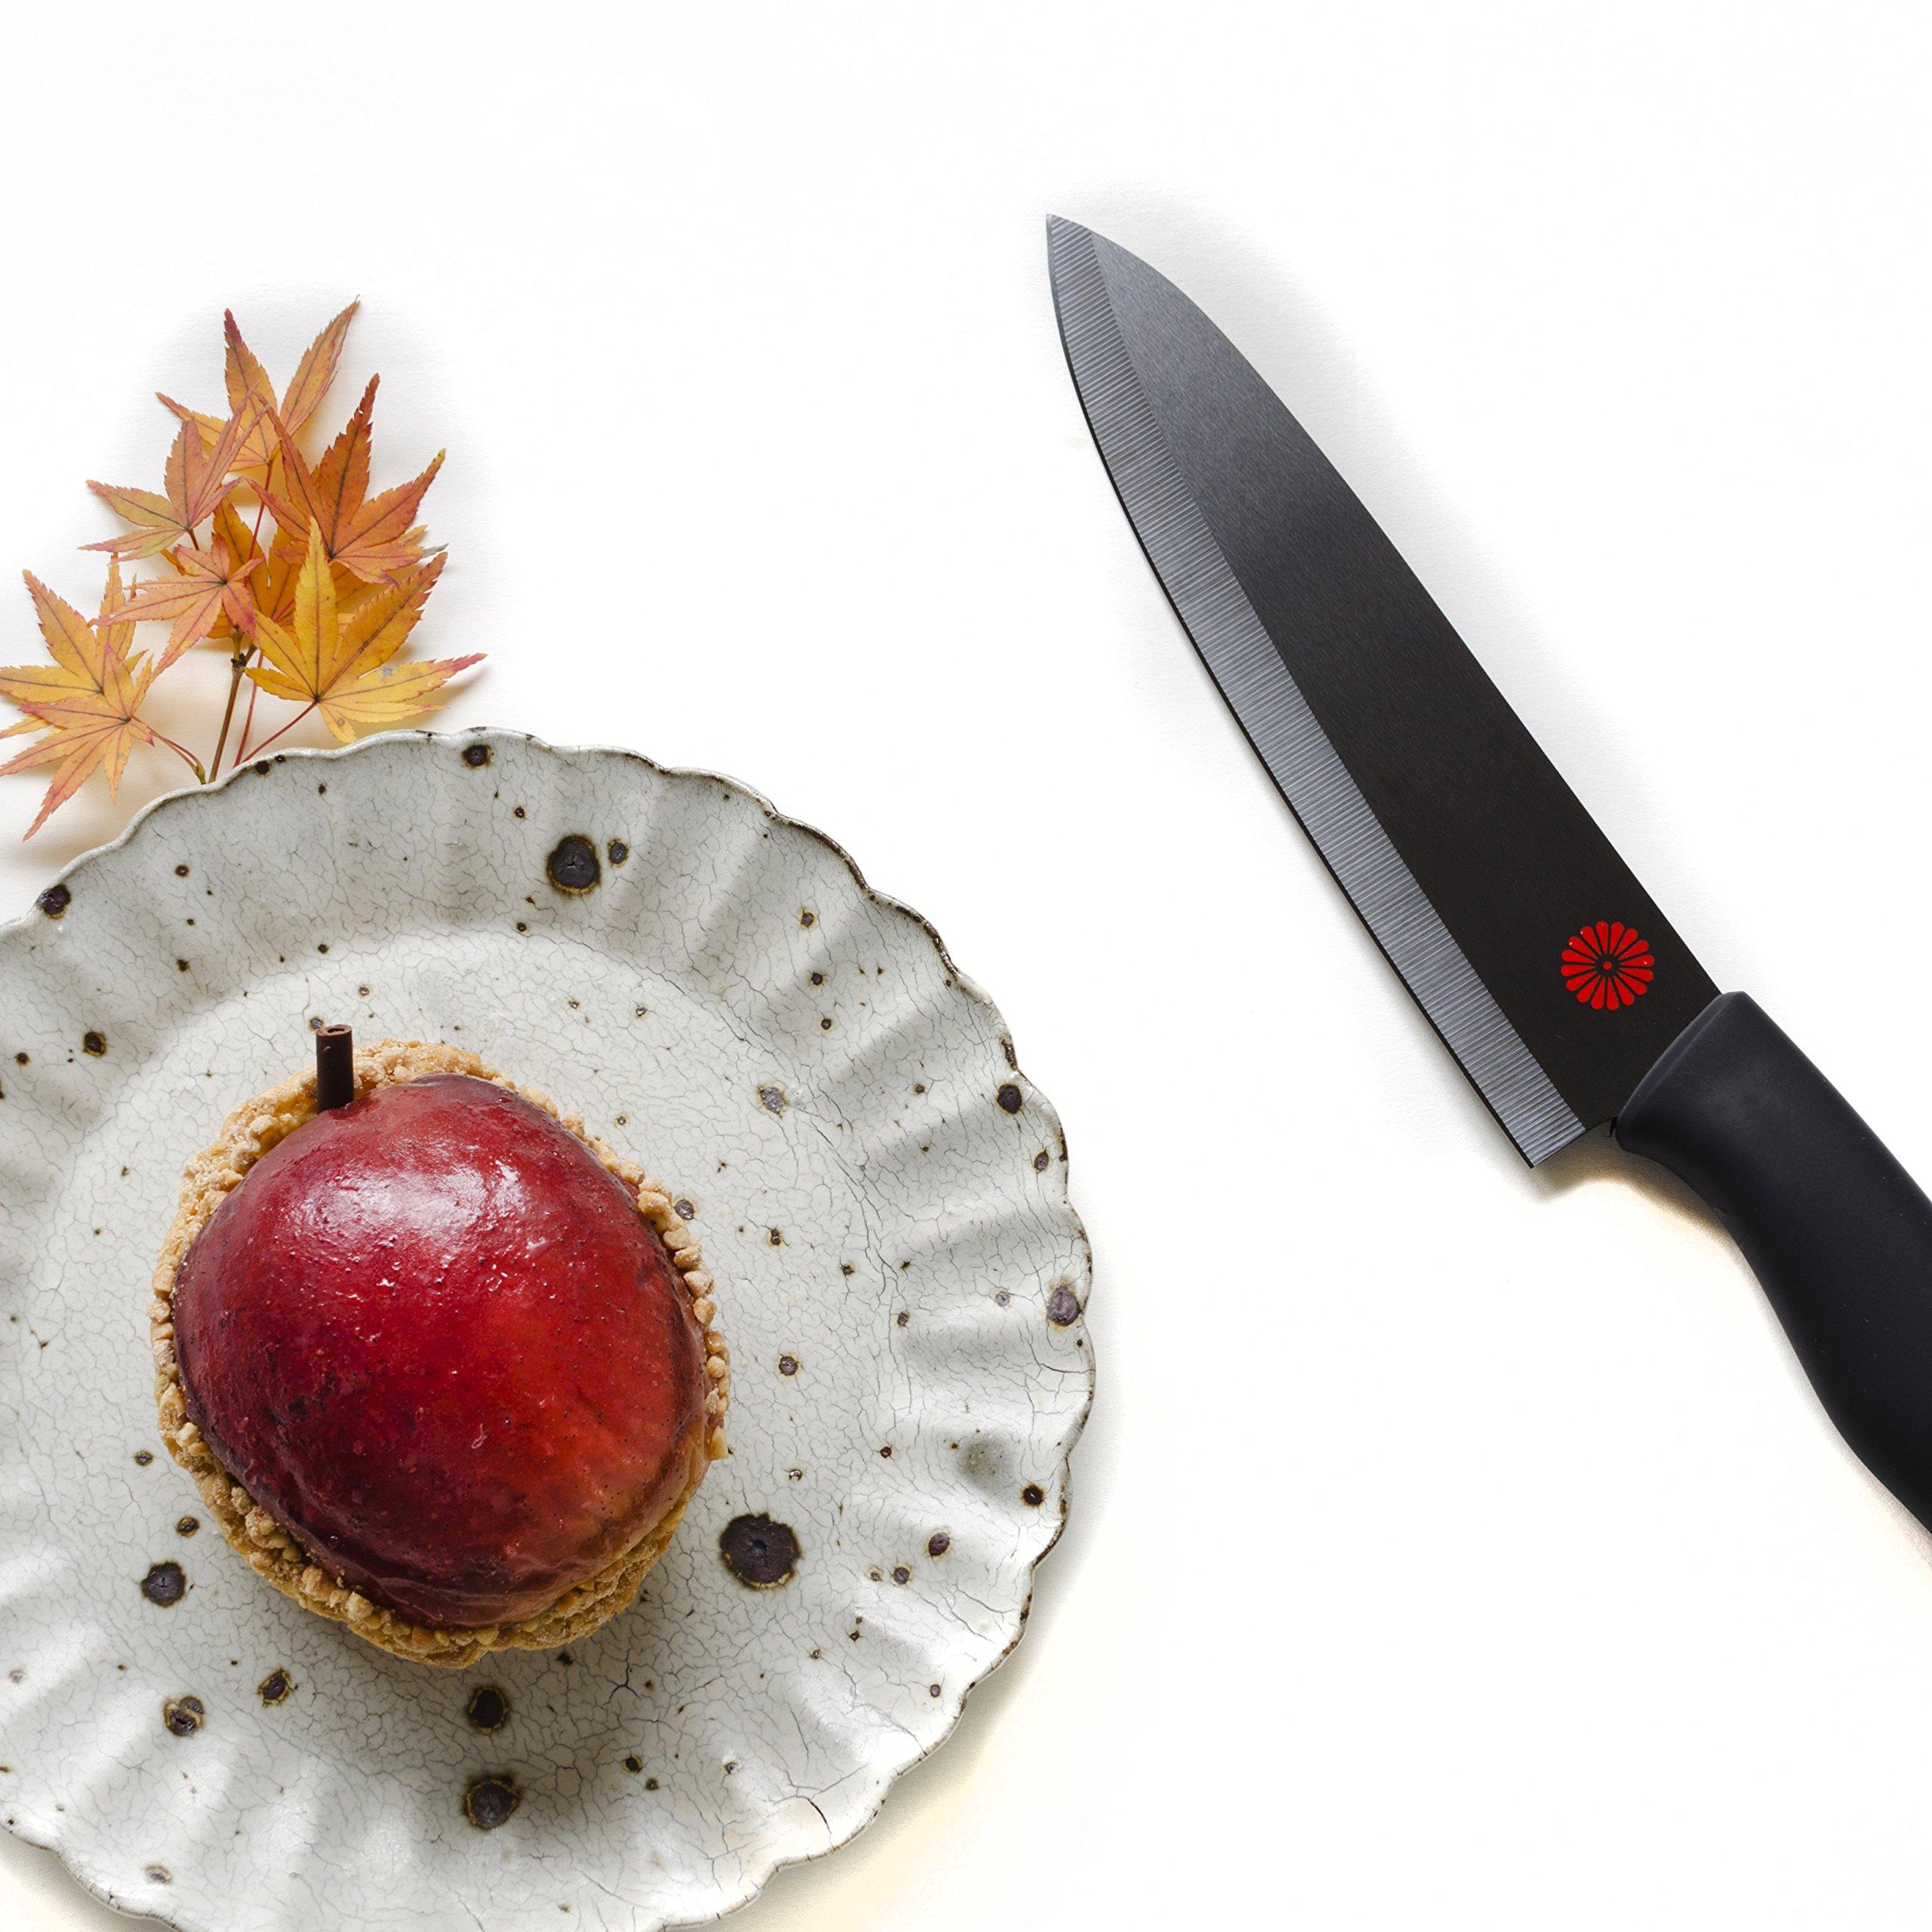 Kikusumi 4-Piece Chef Knife Gift Set Bundle - SUMI Black Handle + Black Ceramic Blade - 7 inch Gyuto Chef Knife + 5 inch Santoku + 3 inch Paring + 8 inch Serrated Bread Knife + 4 Knife Sheaths by Kikusumi (Image #5)